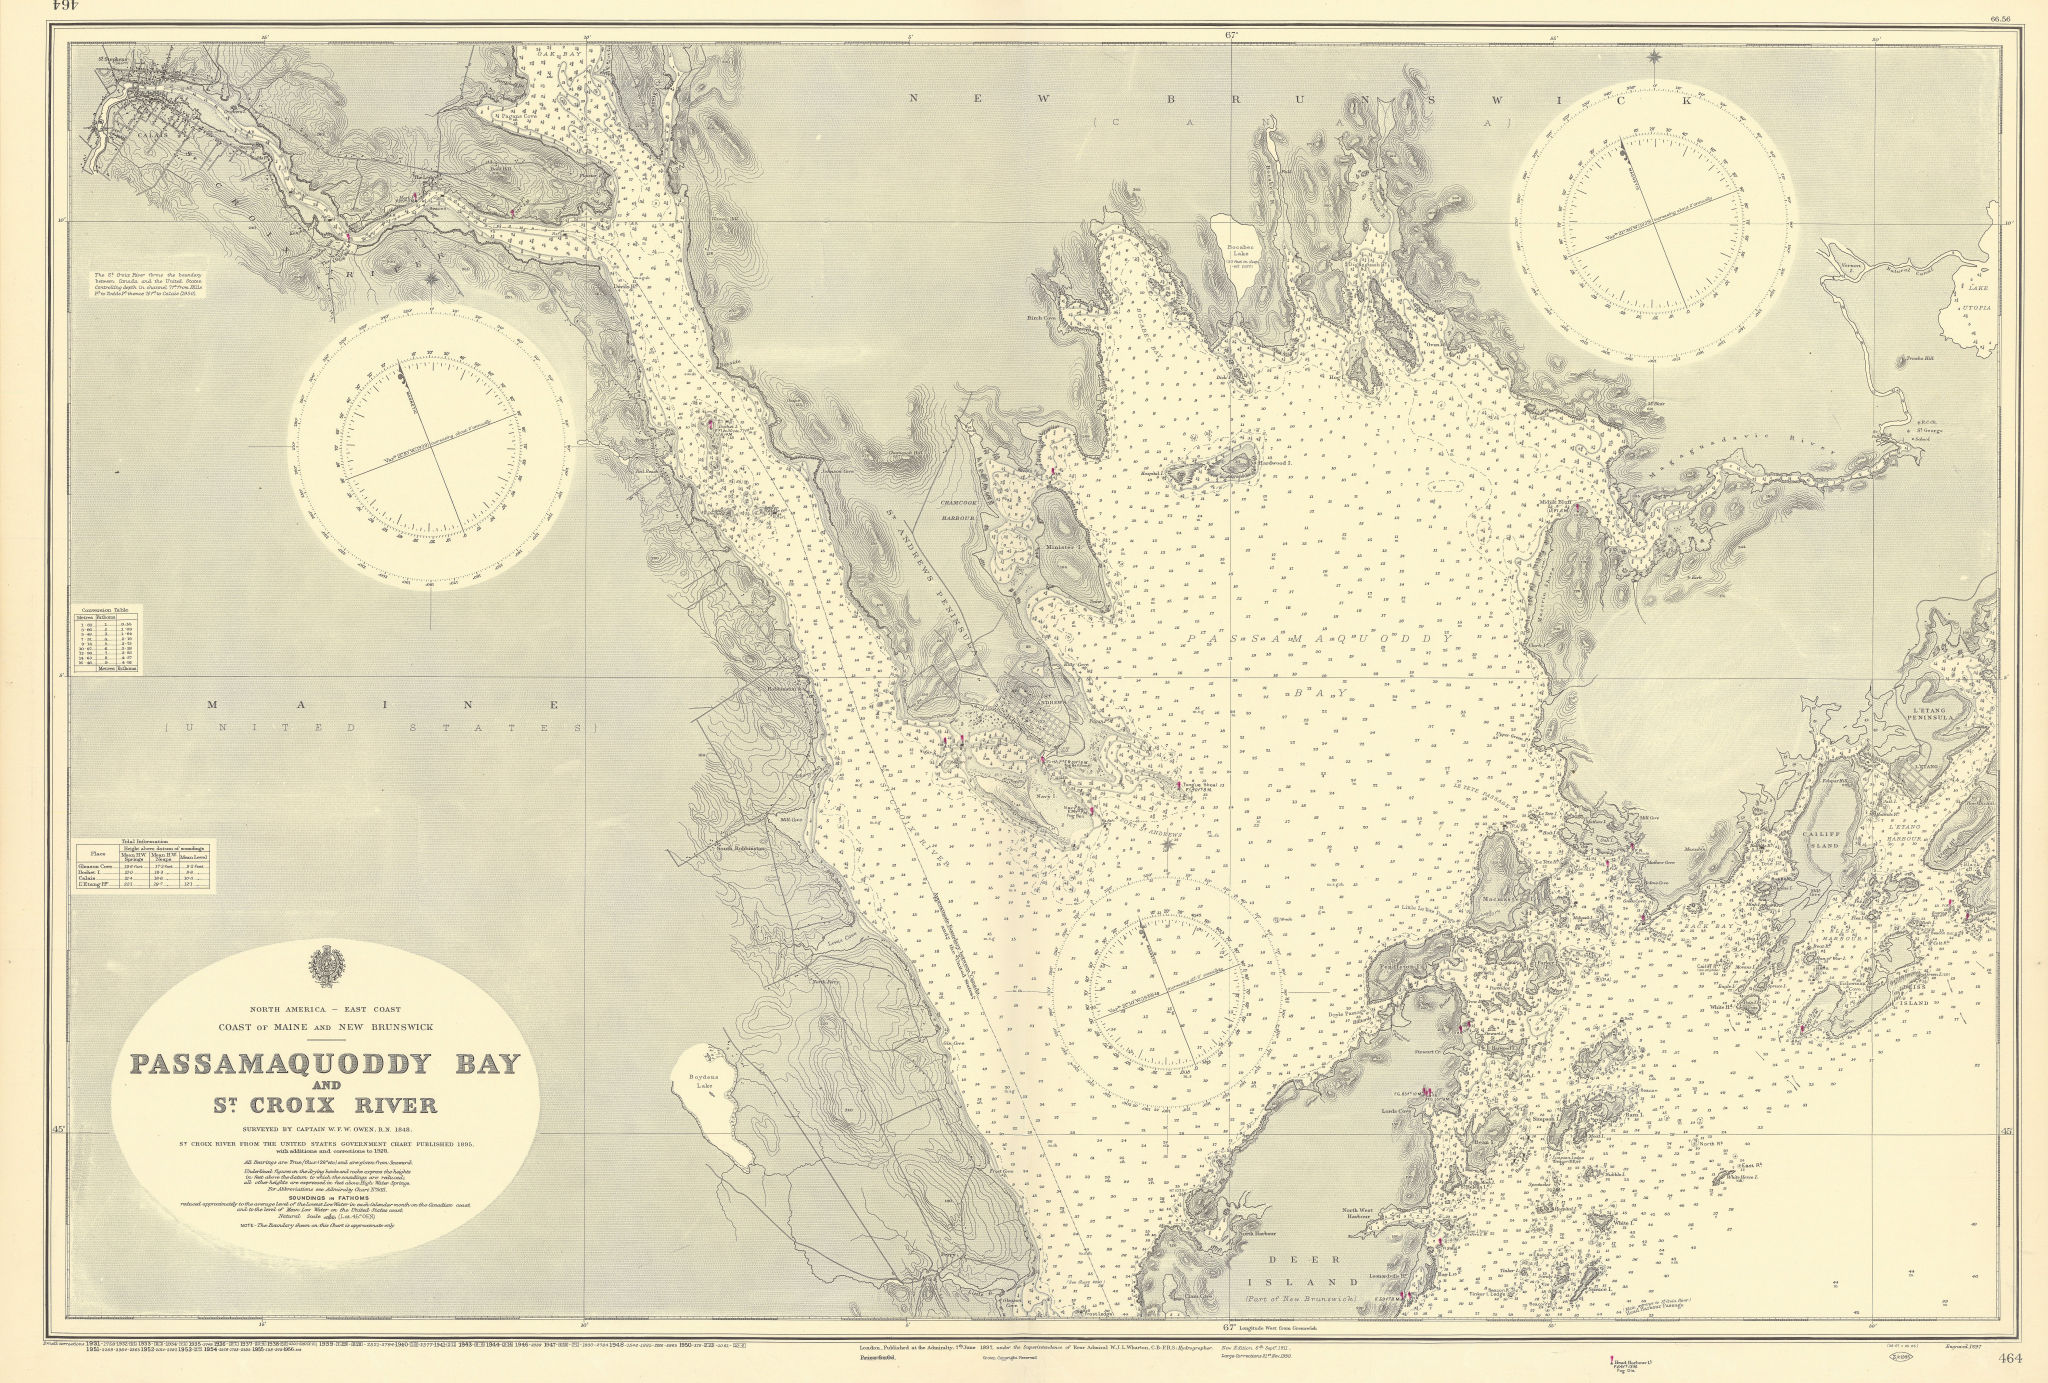 Maine New Brunswick Passamaquoddy Bay St Croix ADMIRALTY chart 1897 (1956) map